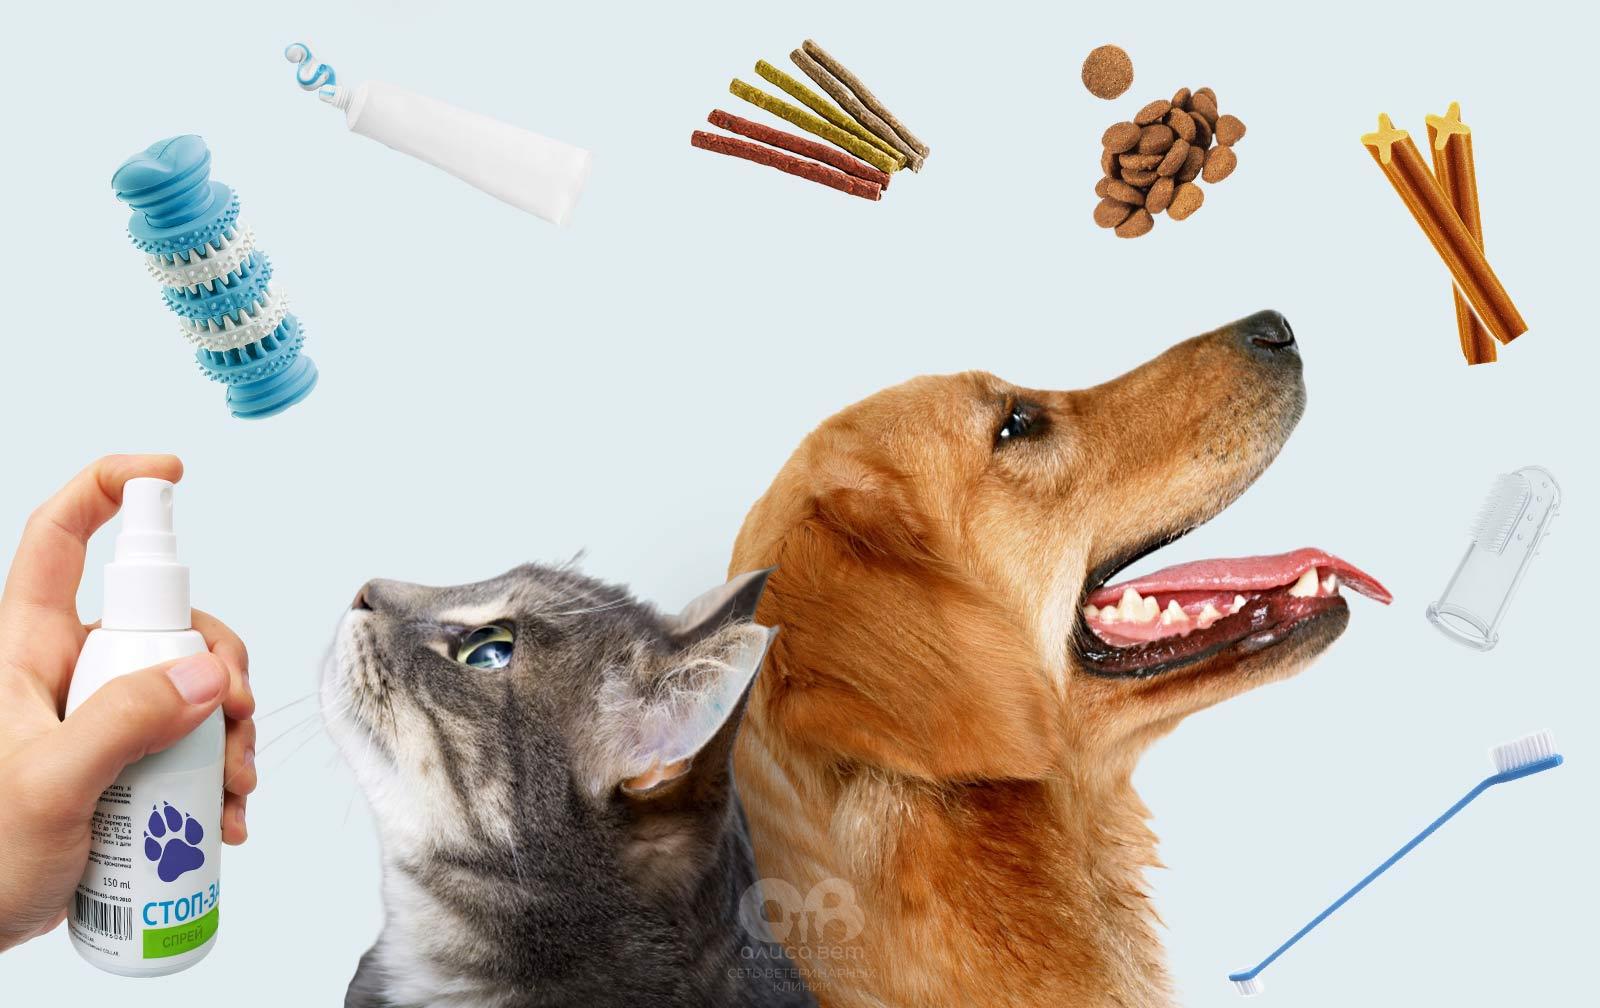 Уход за зубами собаки и кошки в домашних условиях